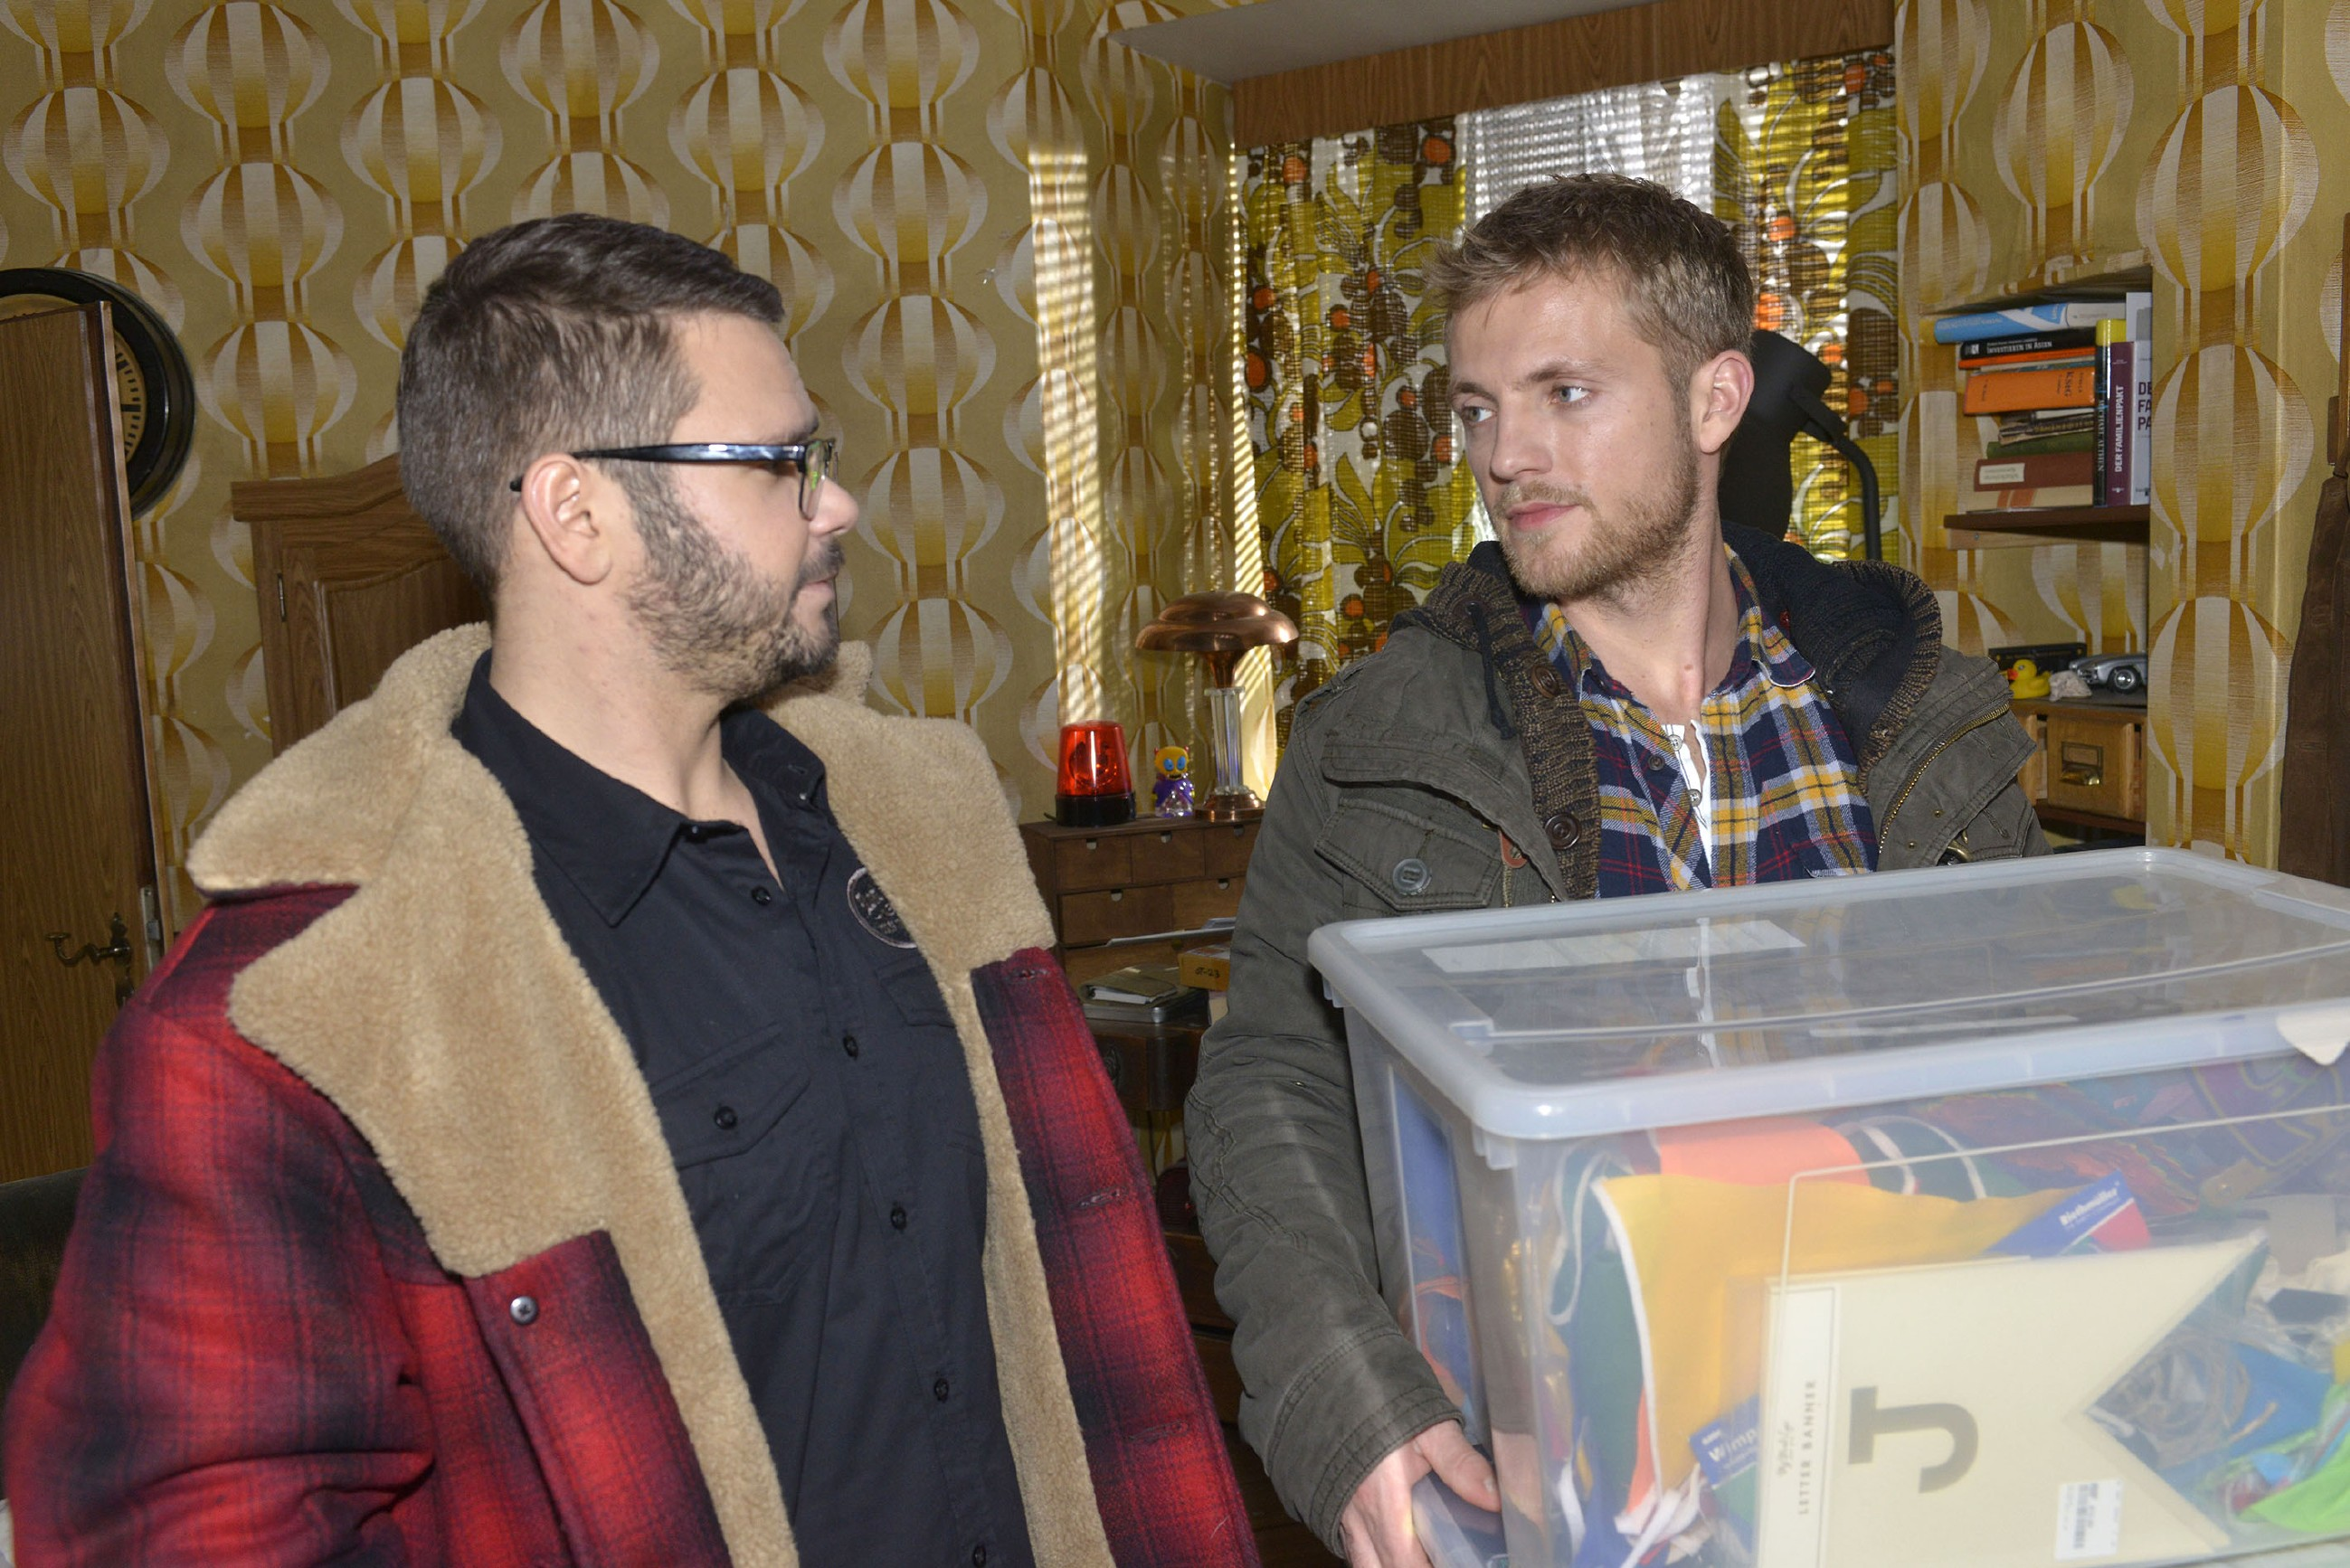 Tuner (Thomas Drechsel, l.) lässt Paul (Niklas Osterloh) wissen, dass er mit Jule abgeschlossen hat. (Quelle: RTL / Rolf Baumgartner)